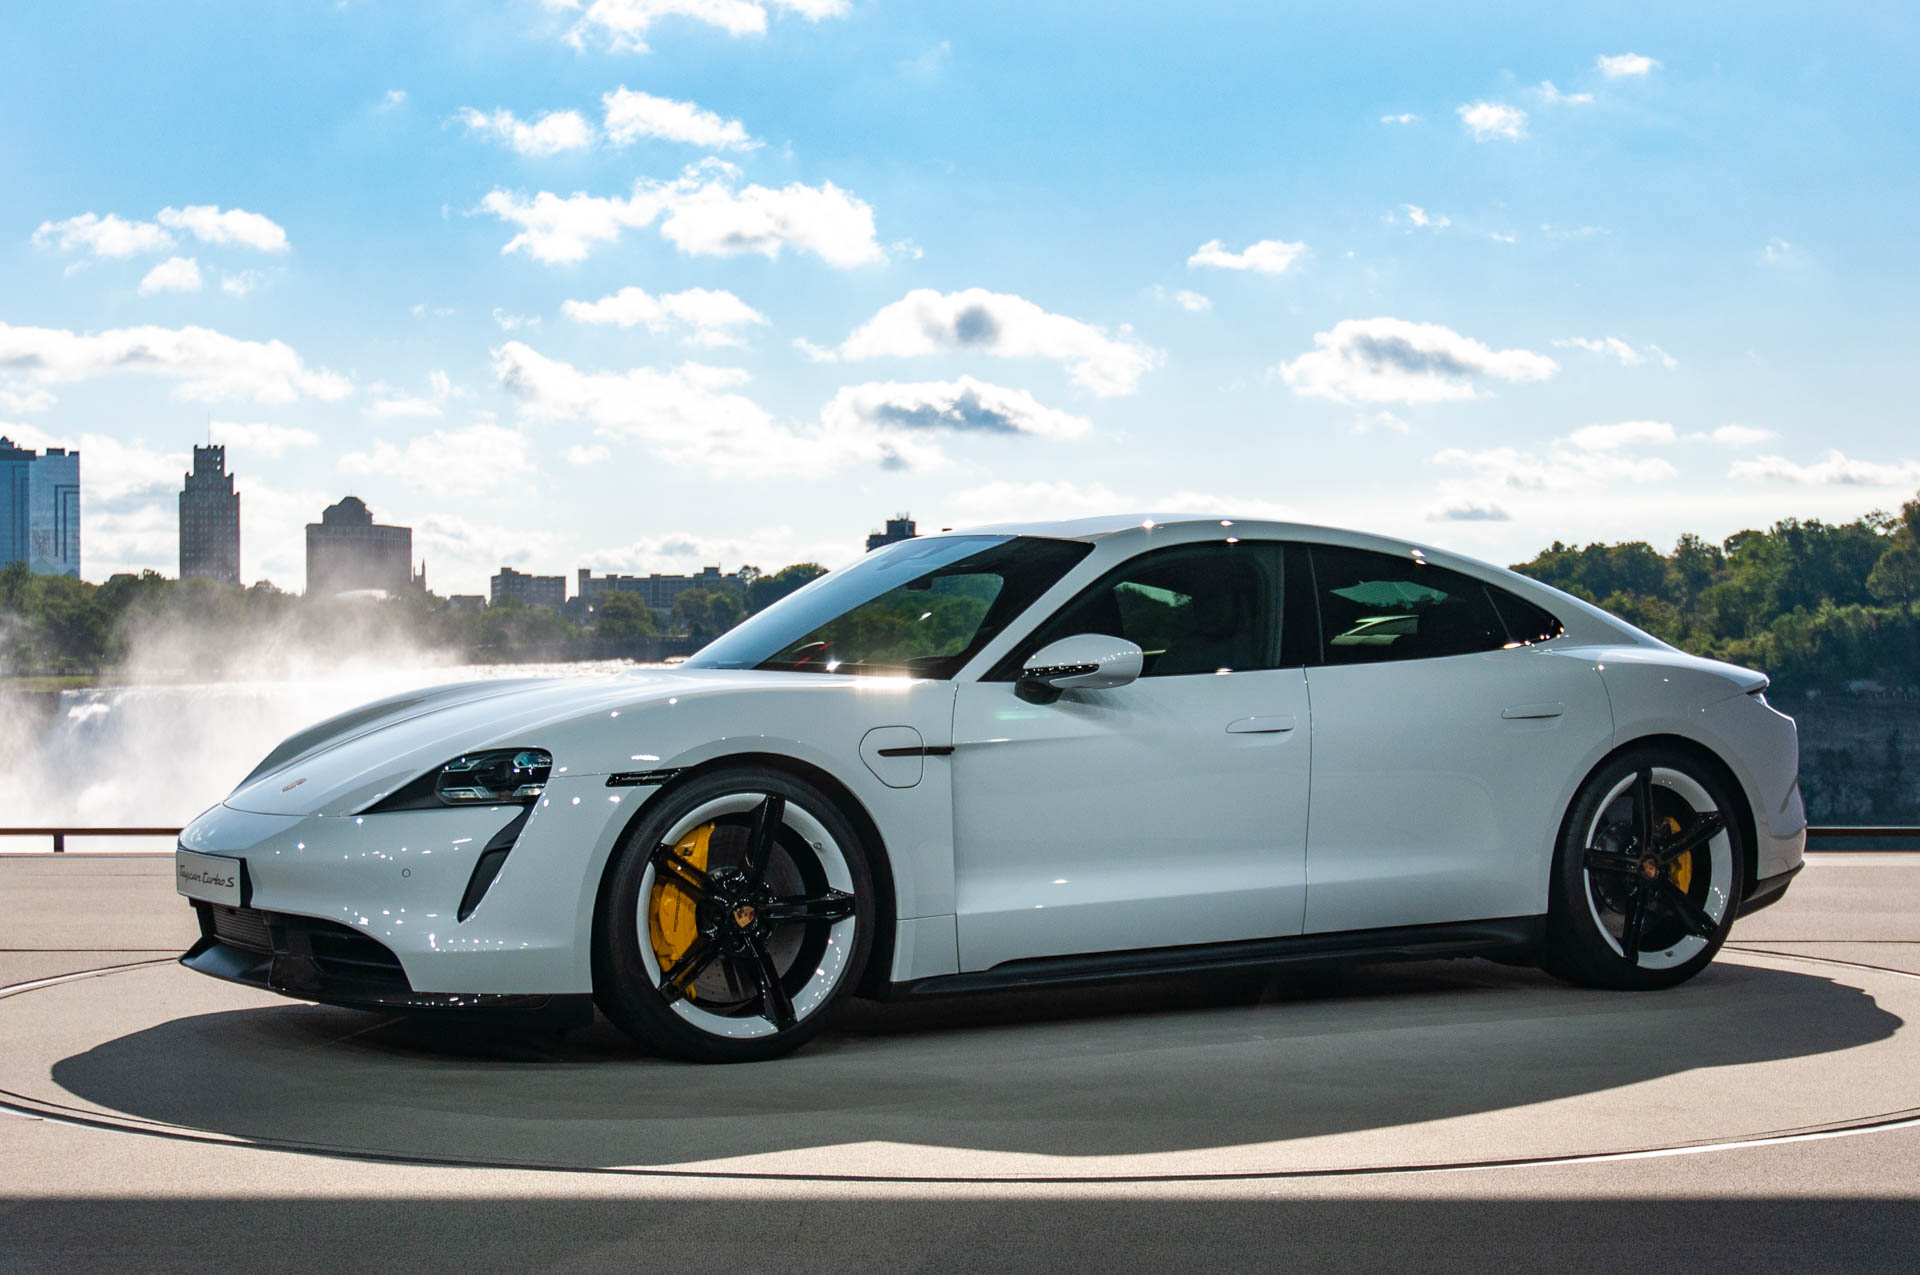 2020 Porsche Taycan, C8 Corvette Convertible, 2020 Toyota